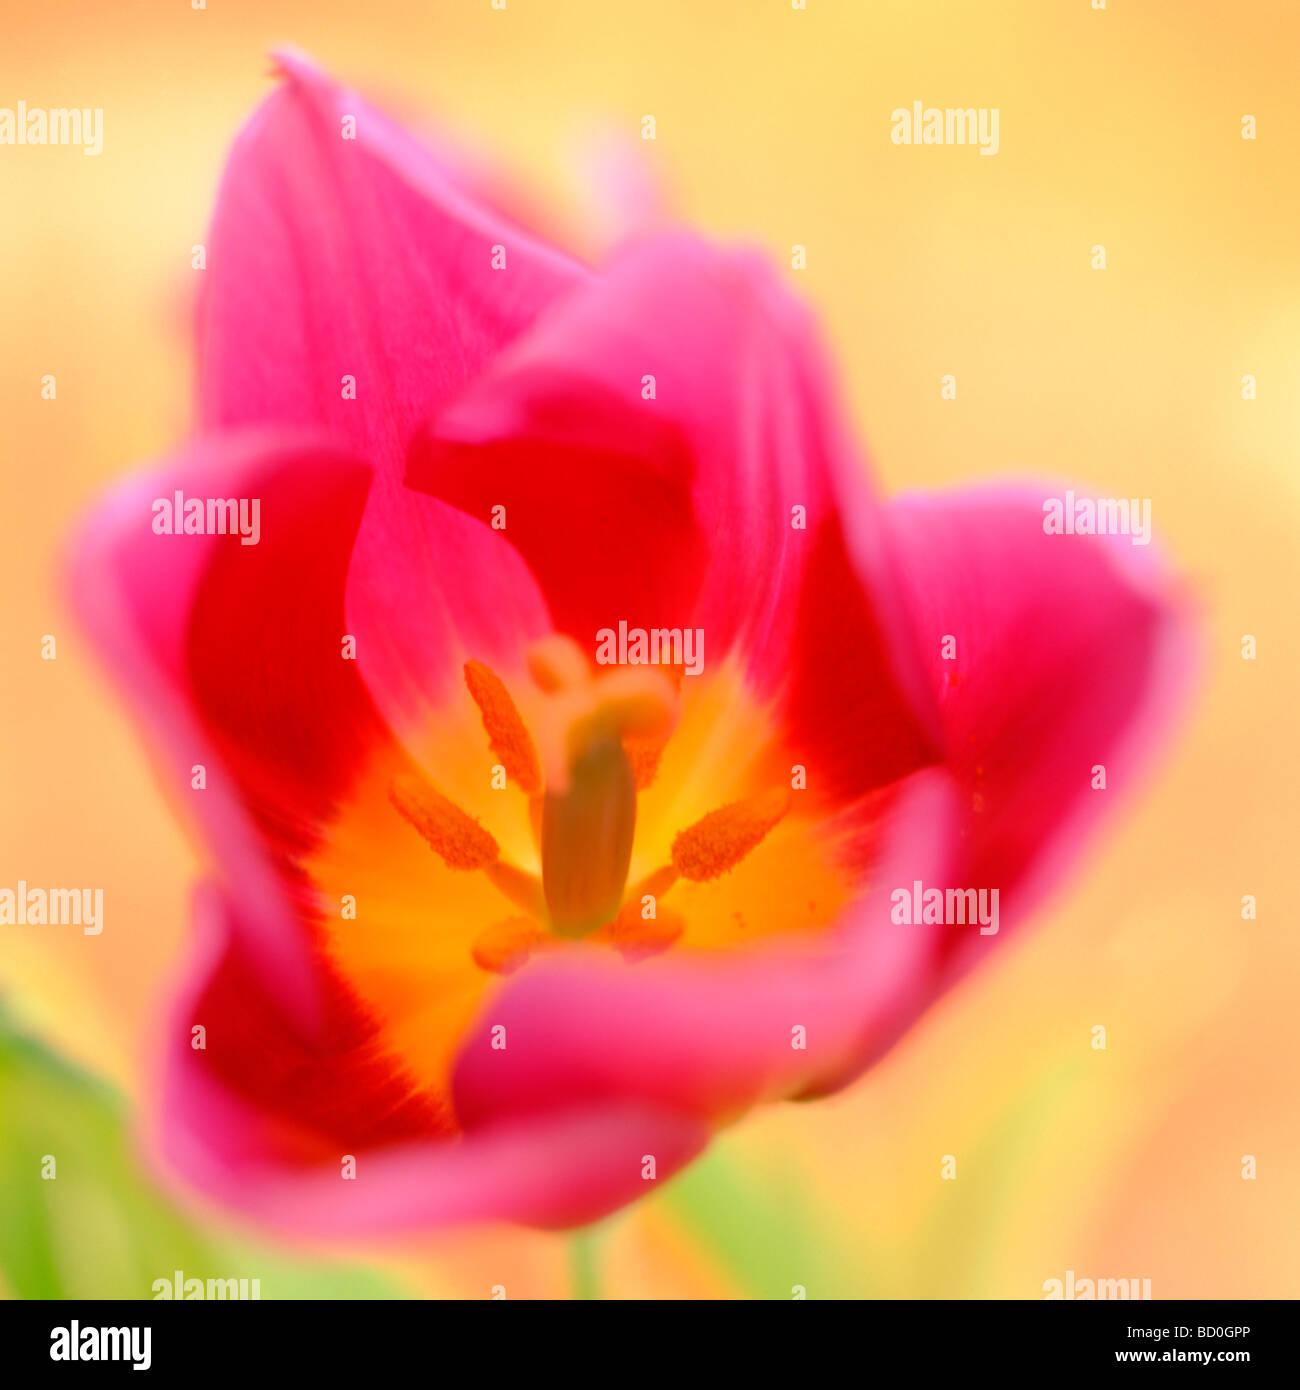 contemporary tulip epitomising spring fine art photography Jane Ann Butler Photography JABP273 Stock Photo